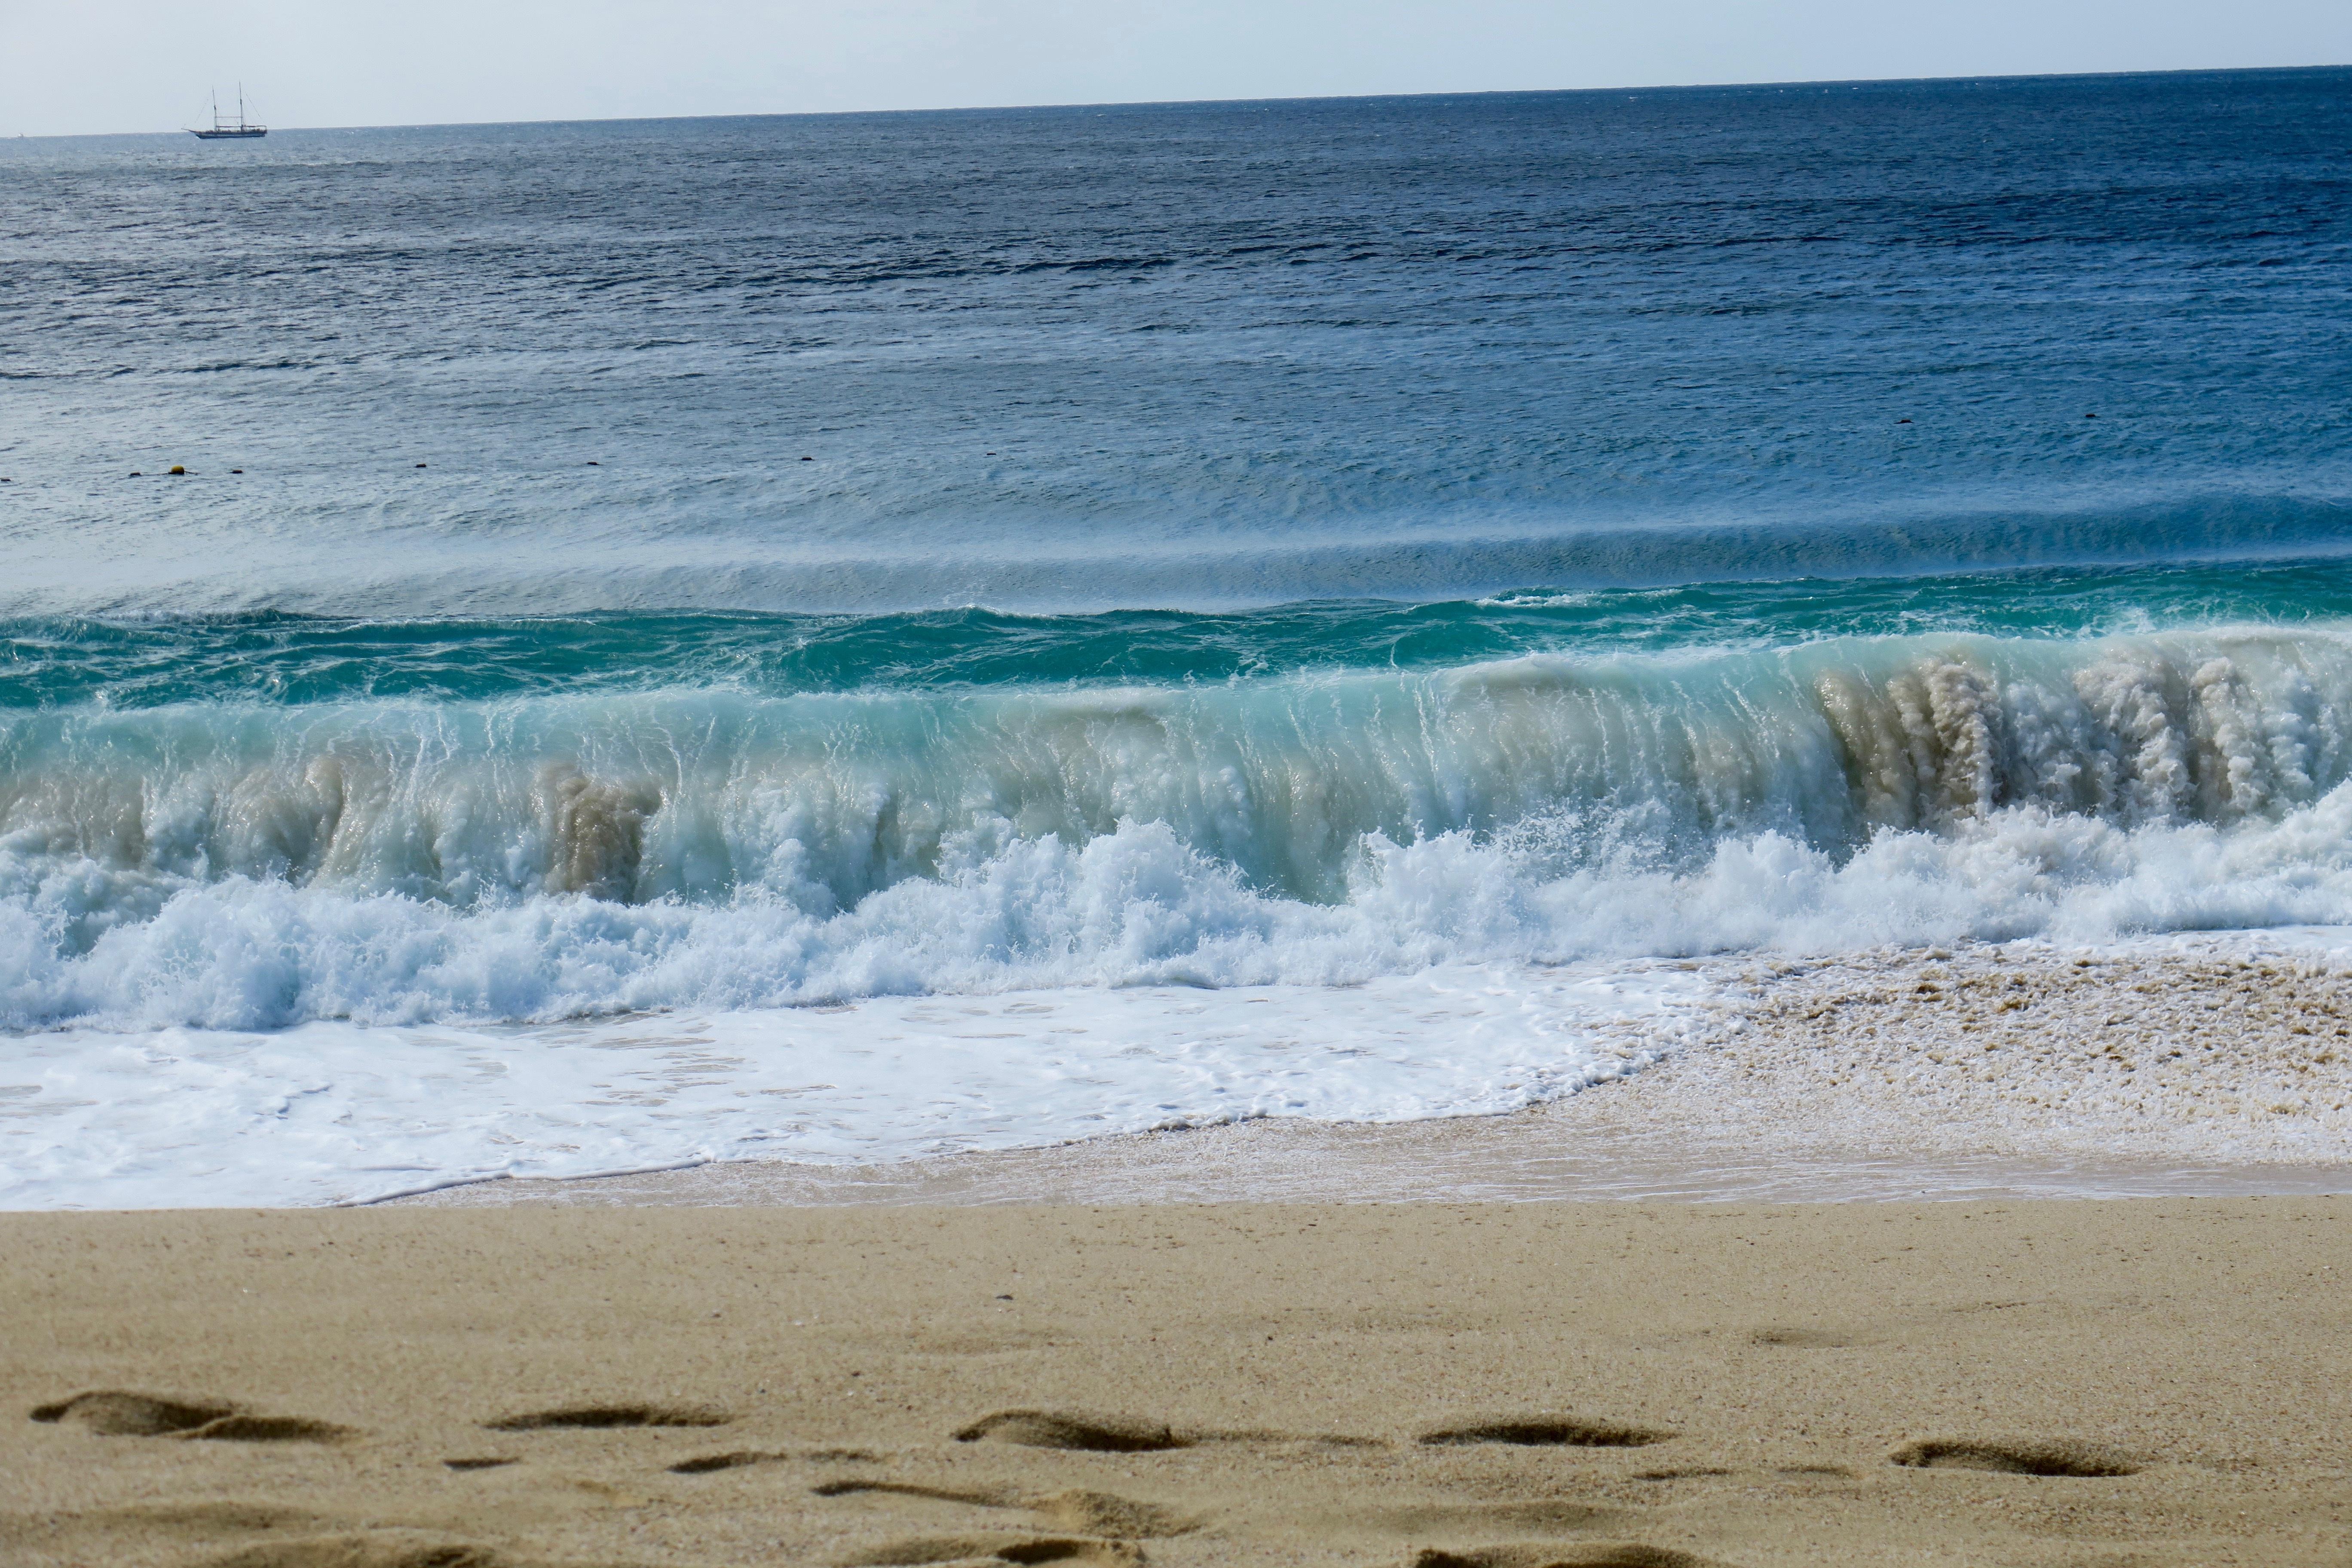 картинки песчаного берега и океана